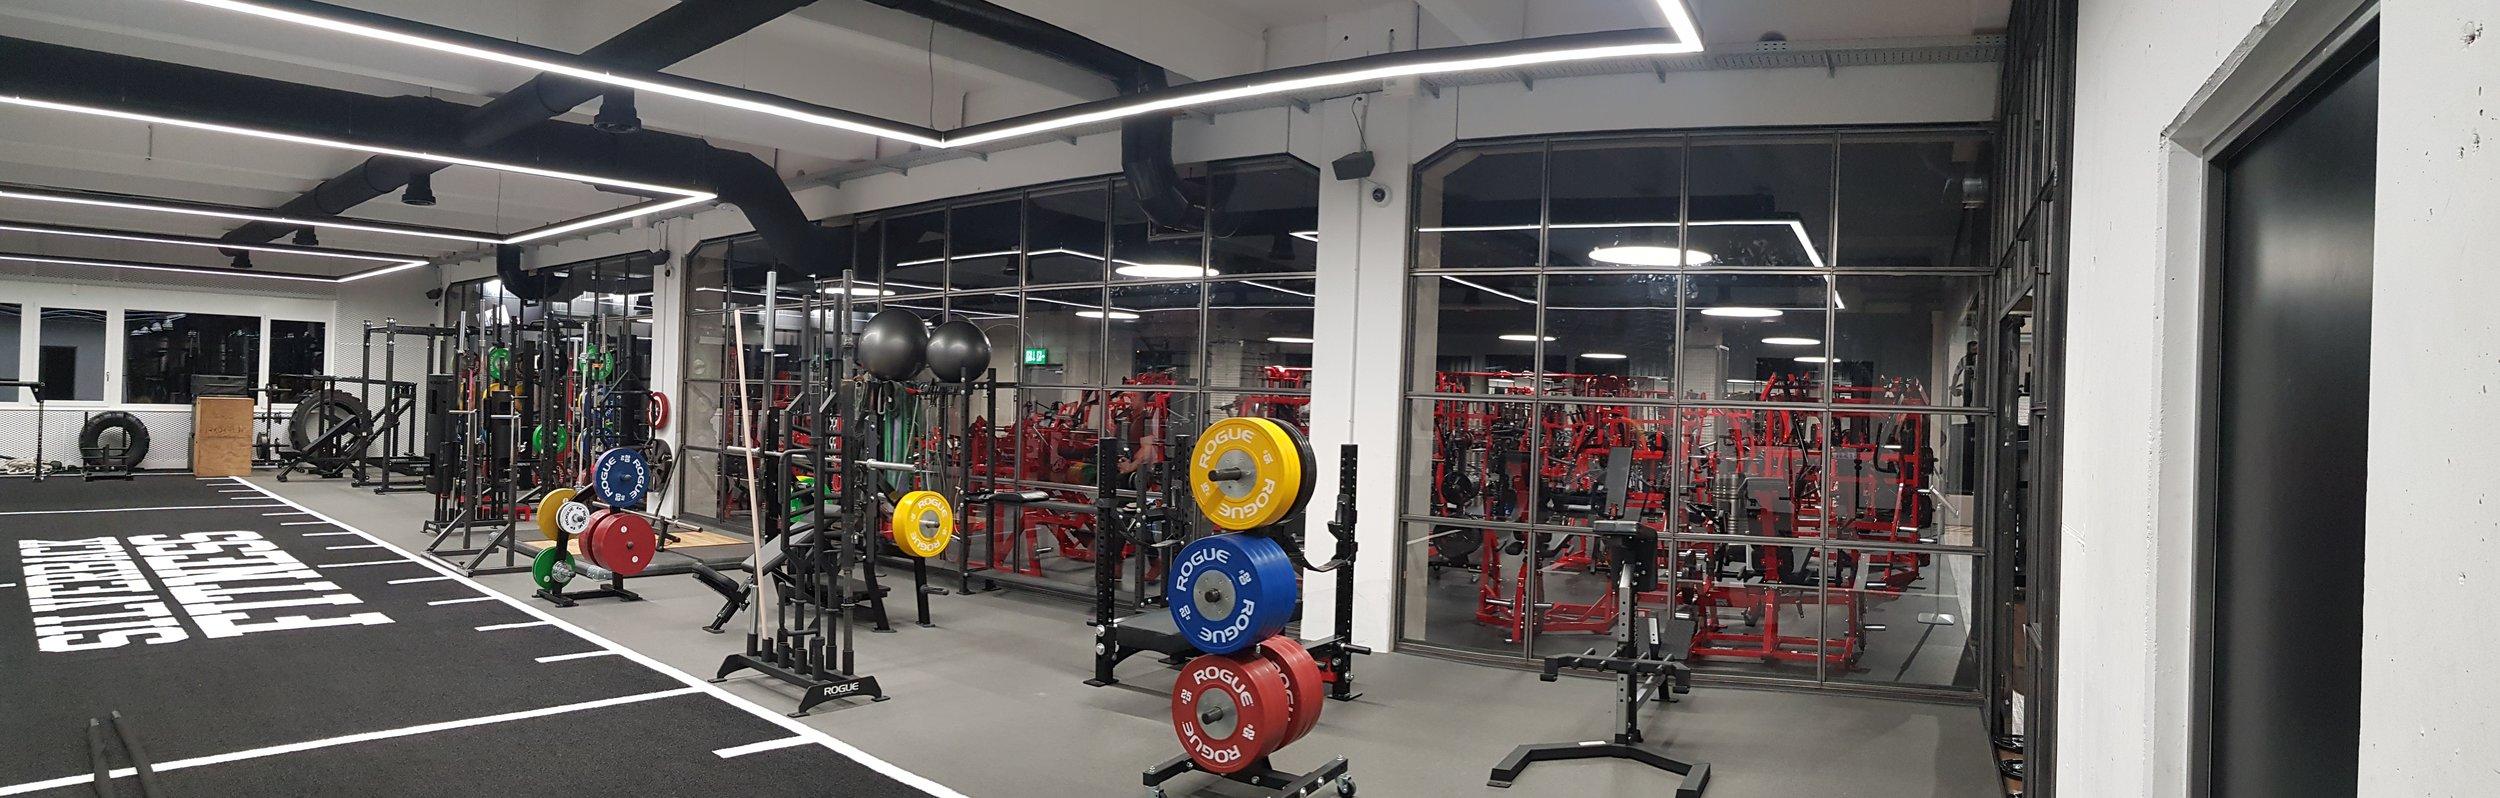 Umzüge gym